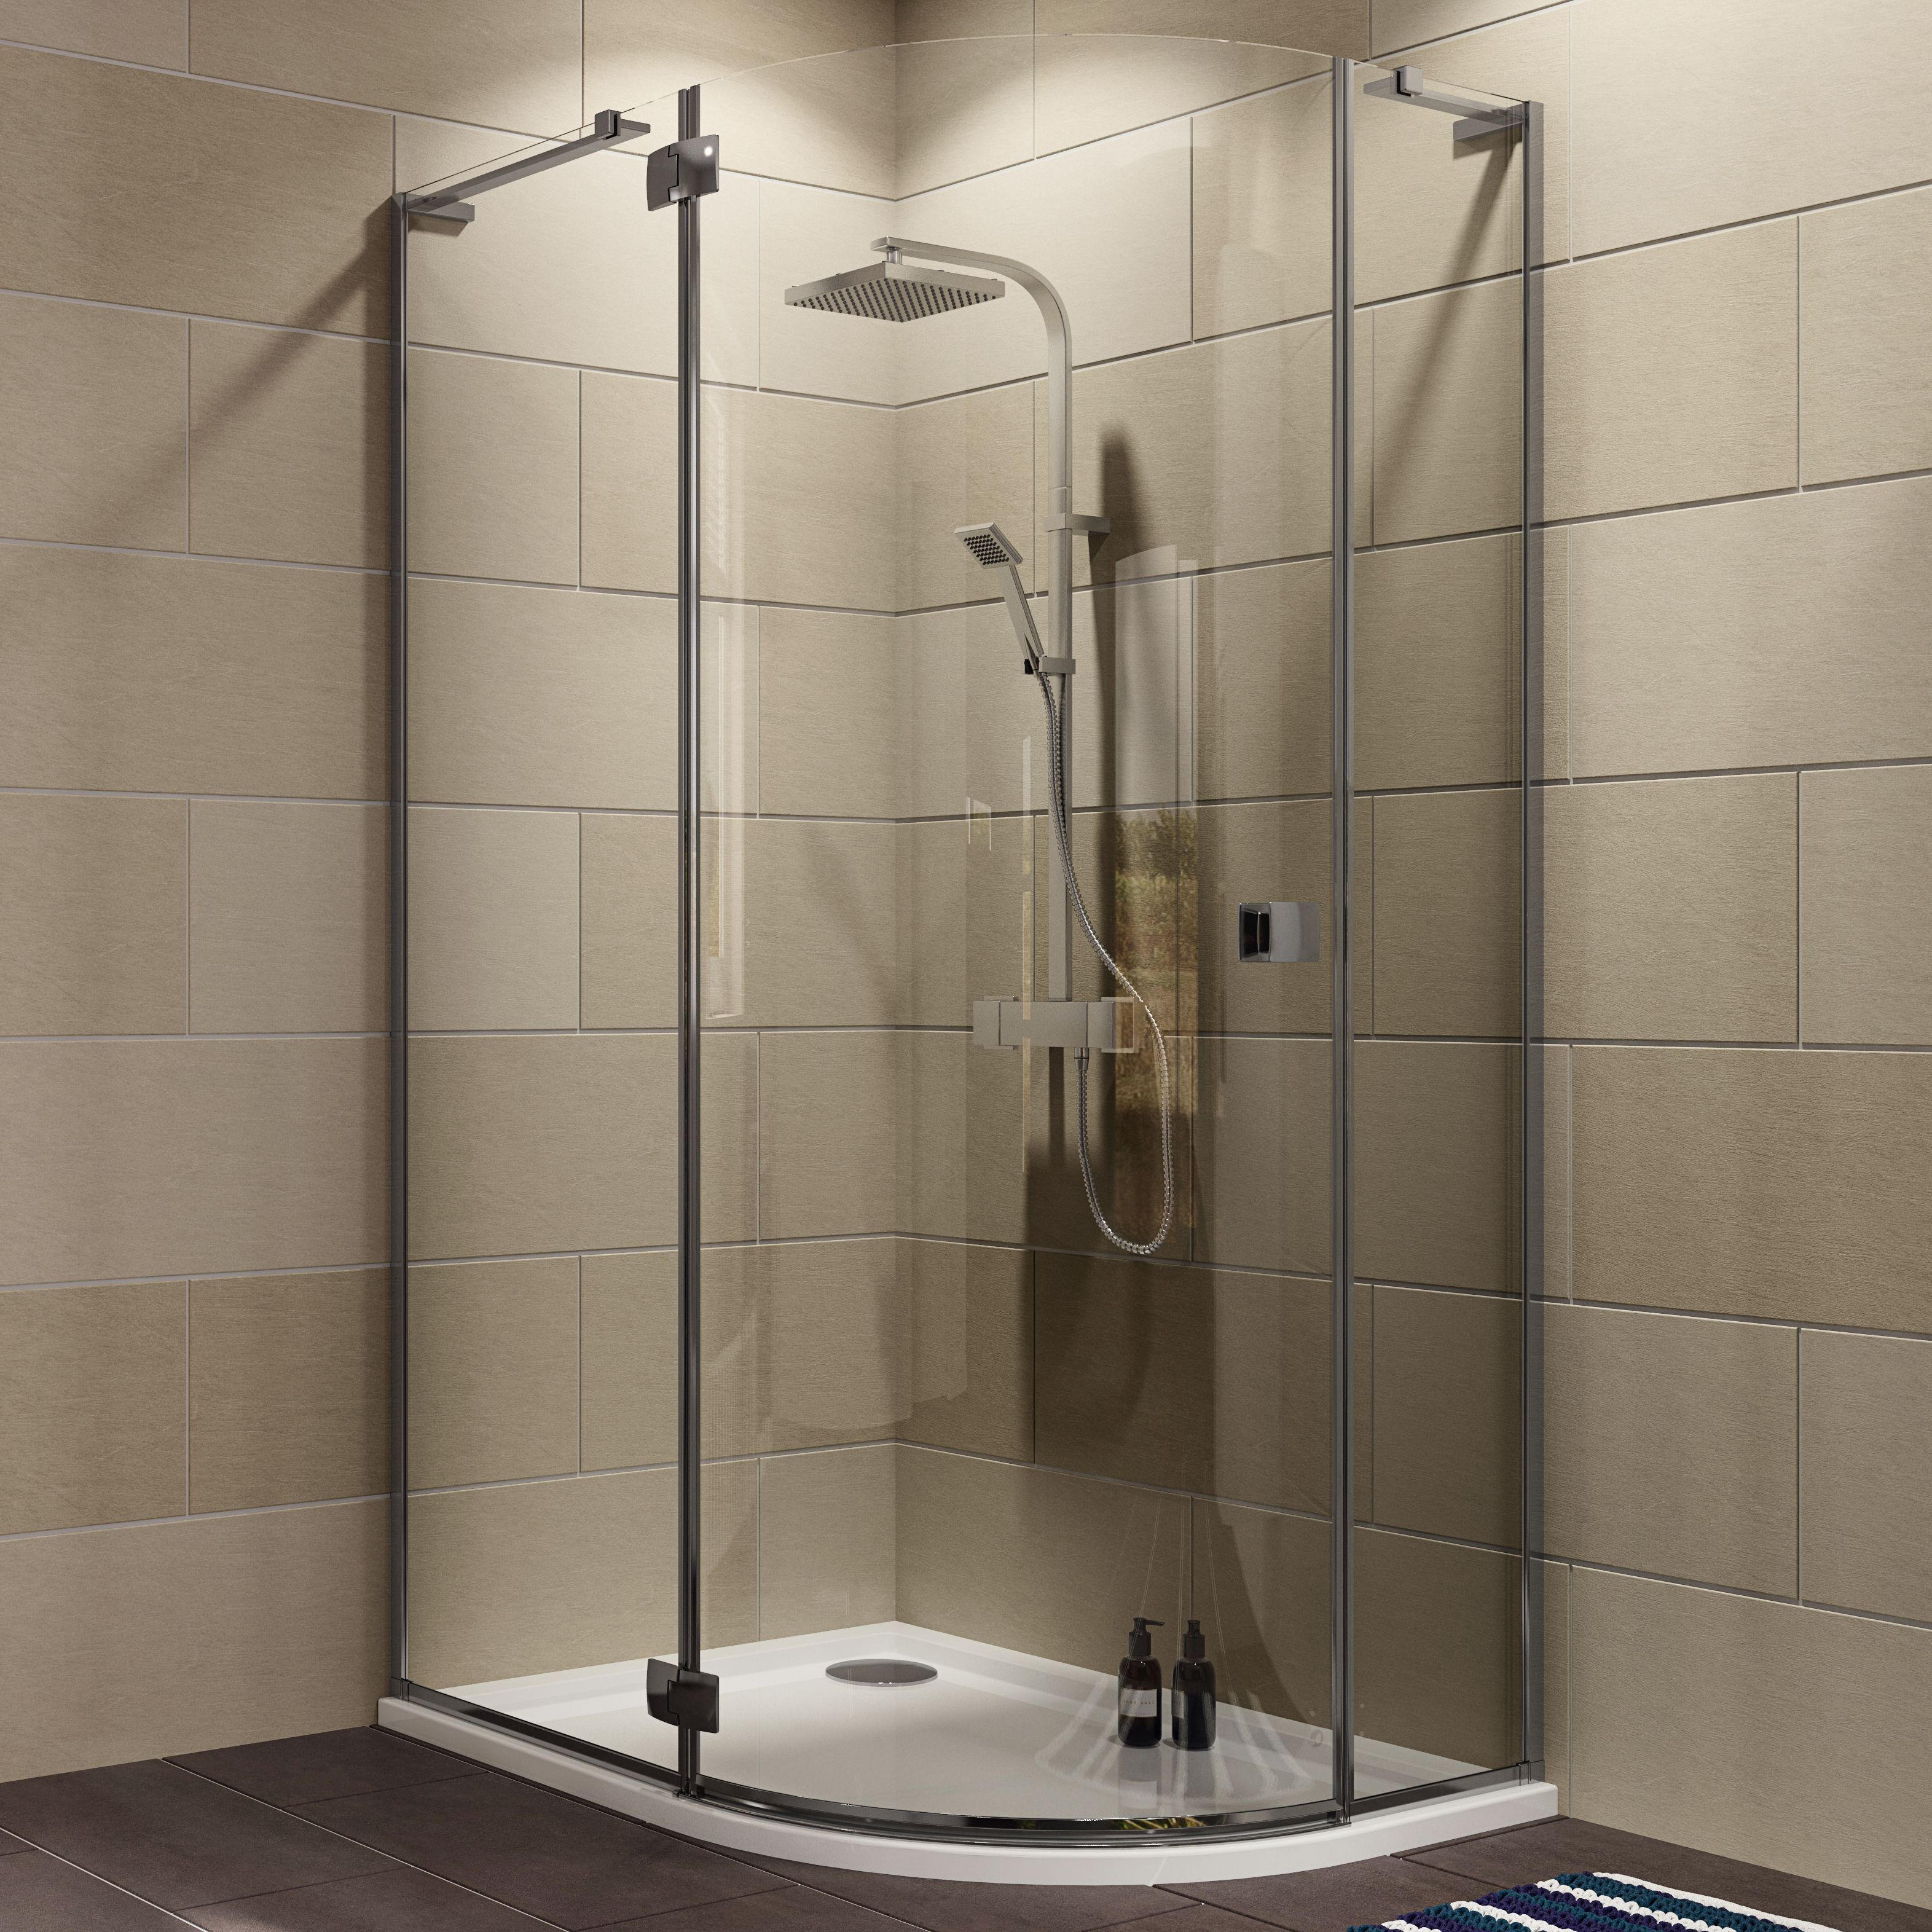 Cooke & Lewis Luxuriant Offset Quadrant LH Shower